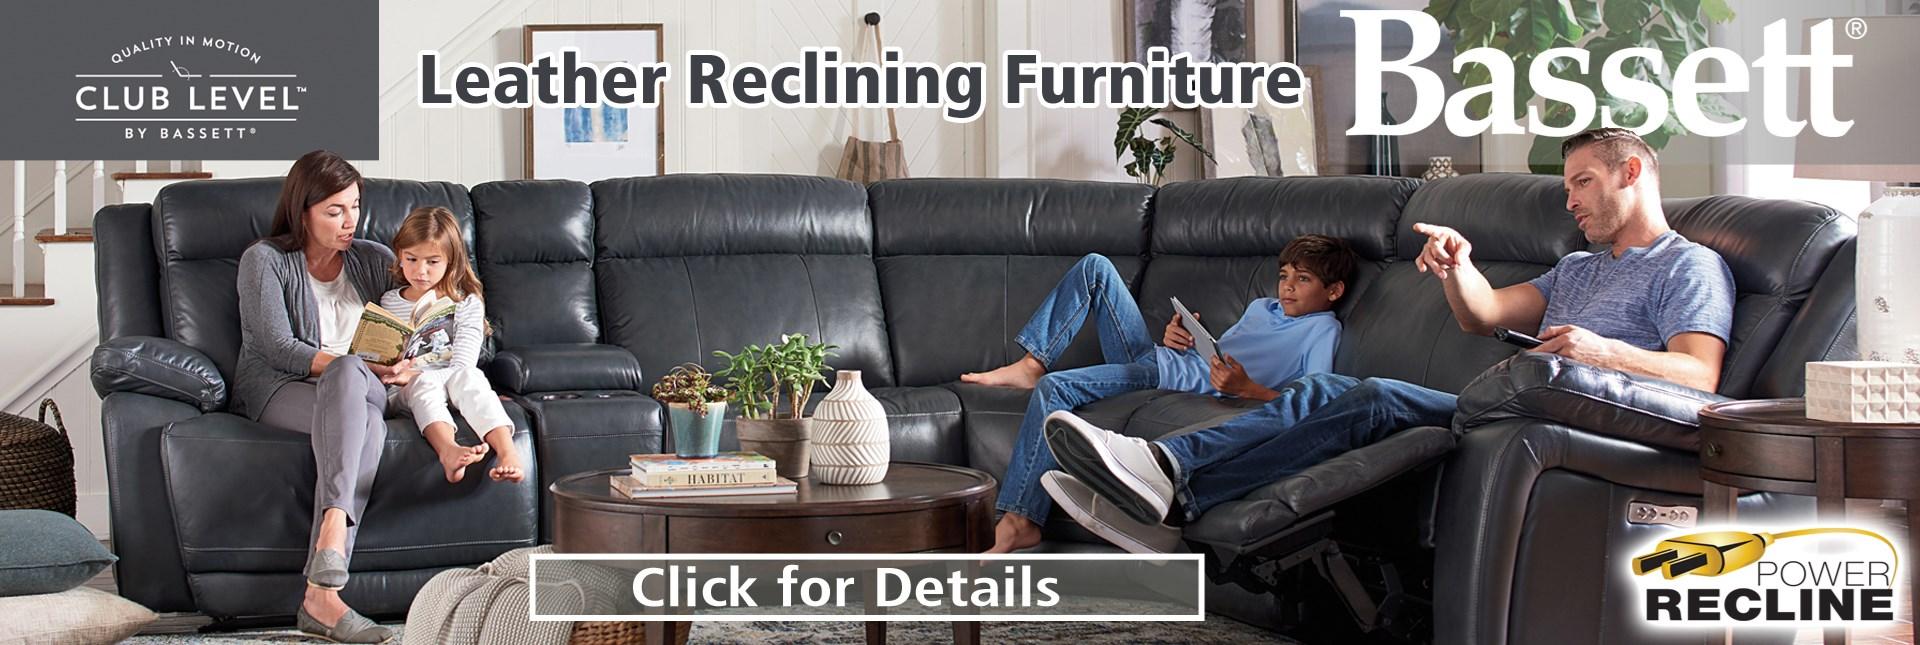 Bassett reclining furniture